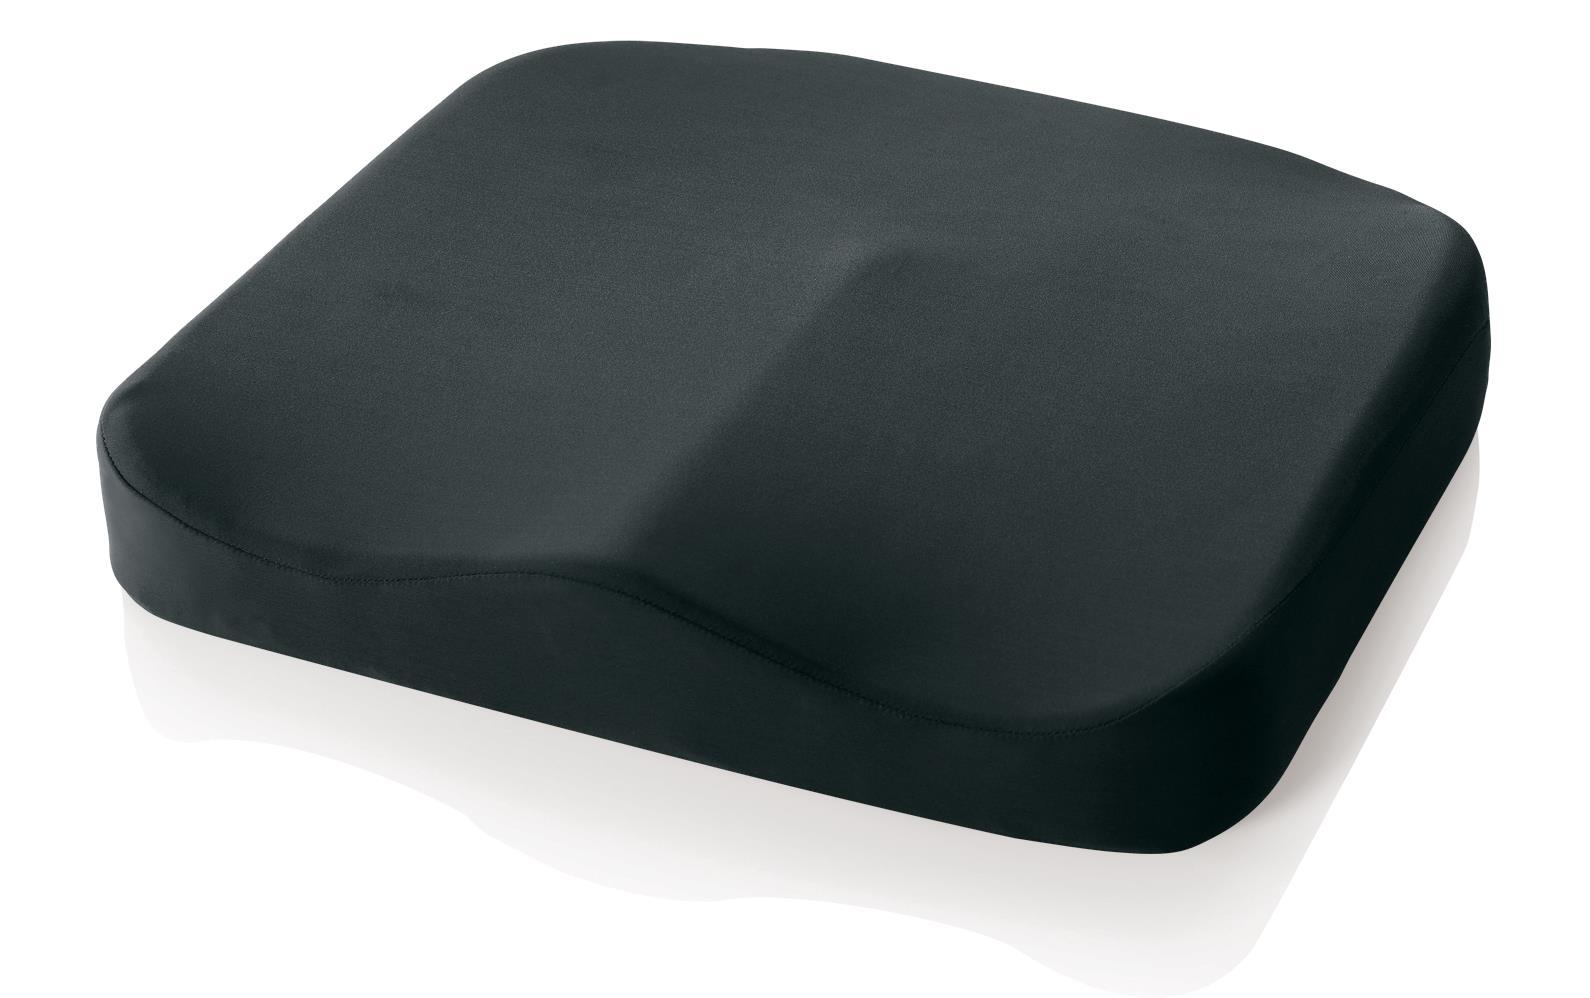 Cushions Tempur-Pedic Seat Cushion by Tempur-Pedic® at SlumberWorld